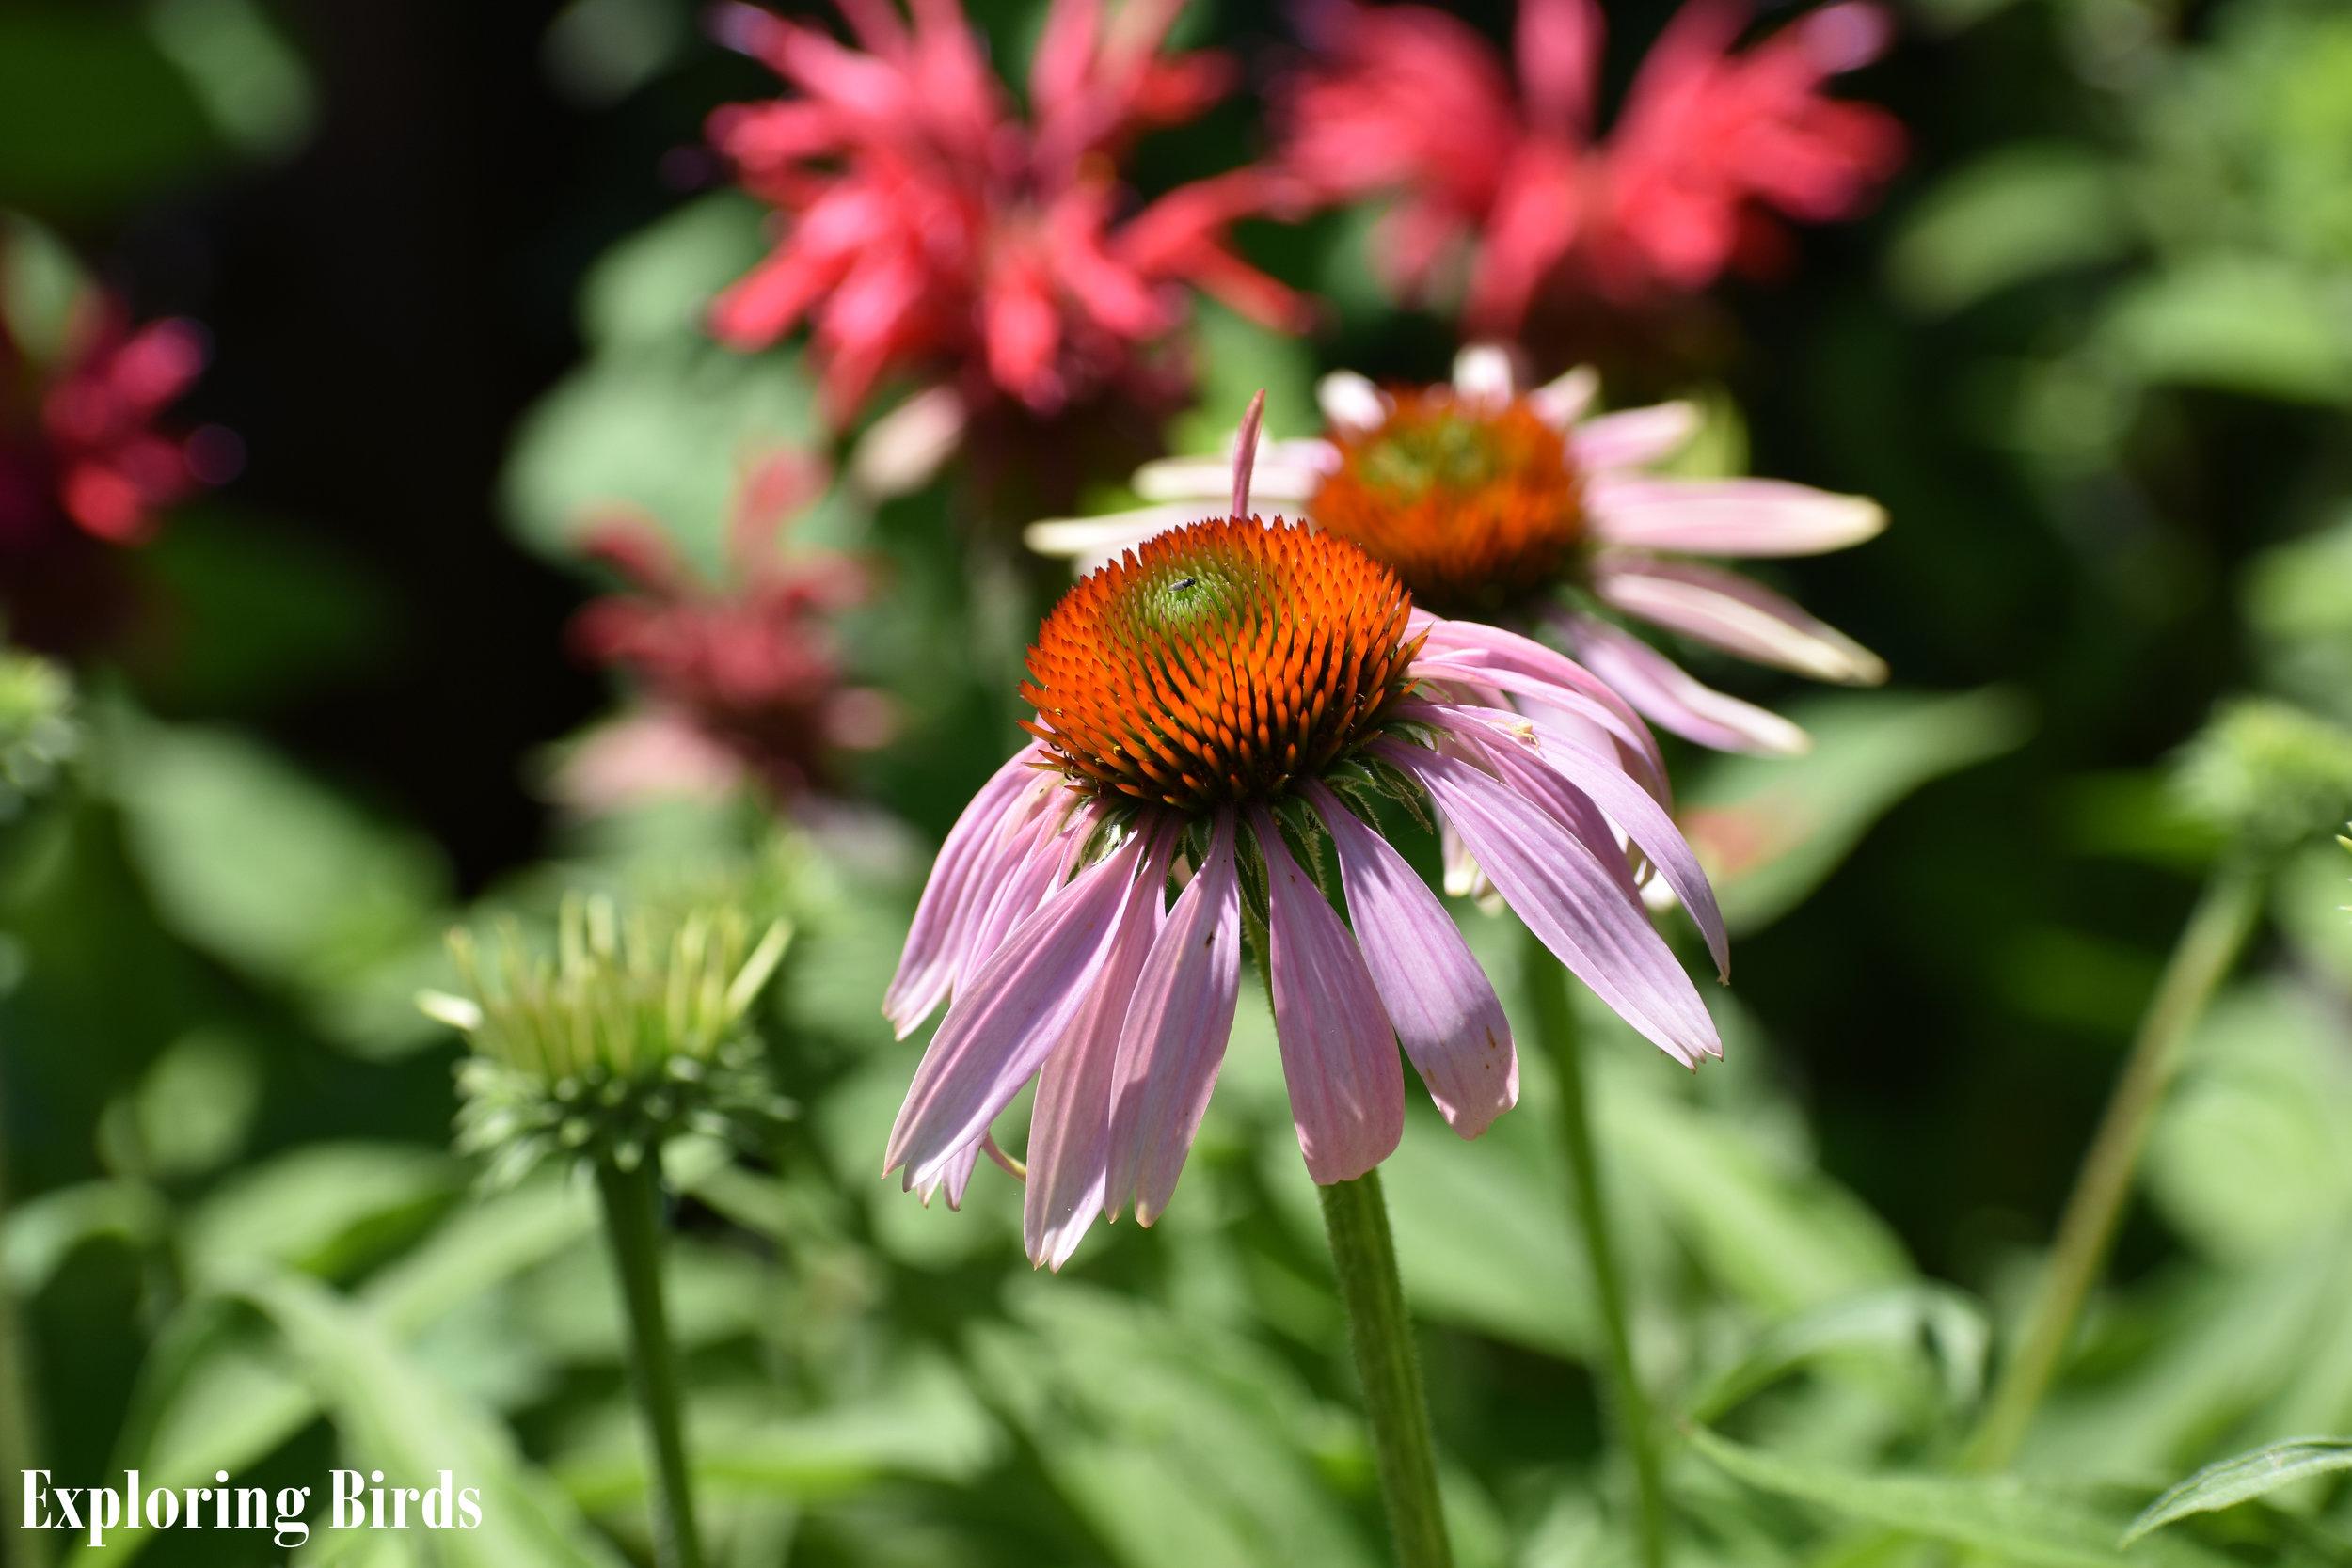 Purple Coneflower attracts butterflies